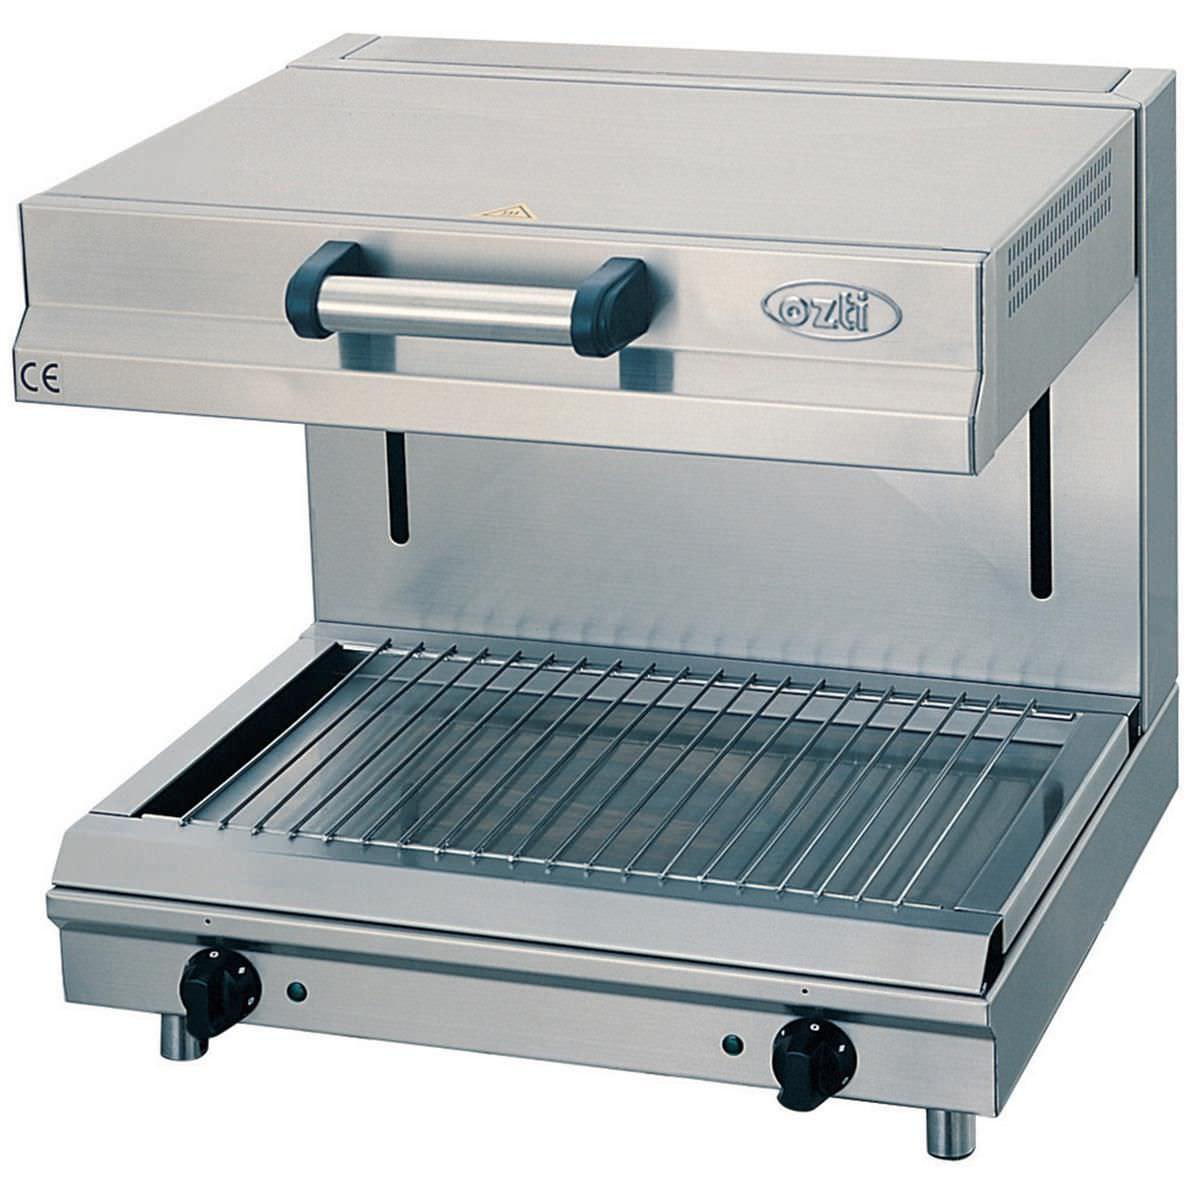 Uncategorized Salamander Kitchen Appliance electric grill countertop commercial salamander 7850 58575 70